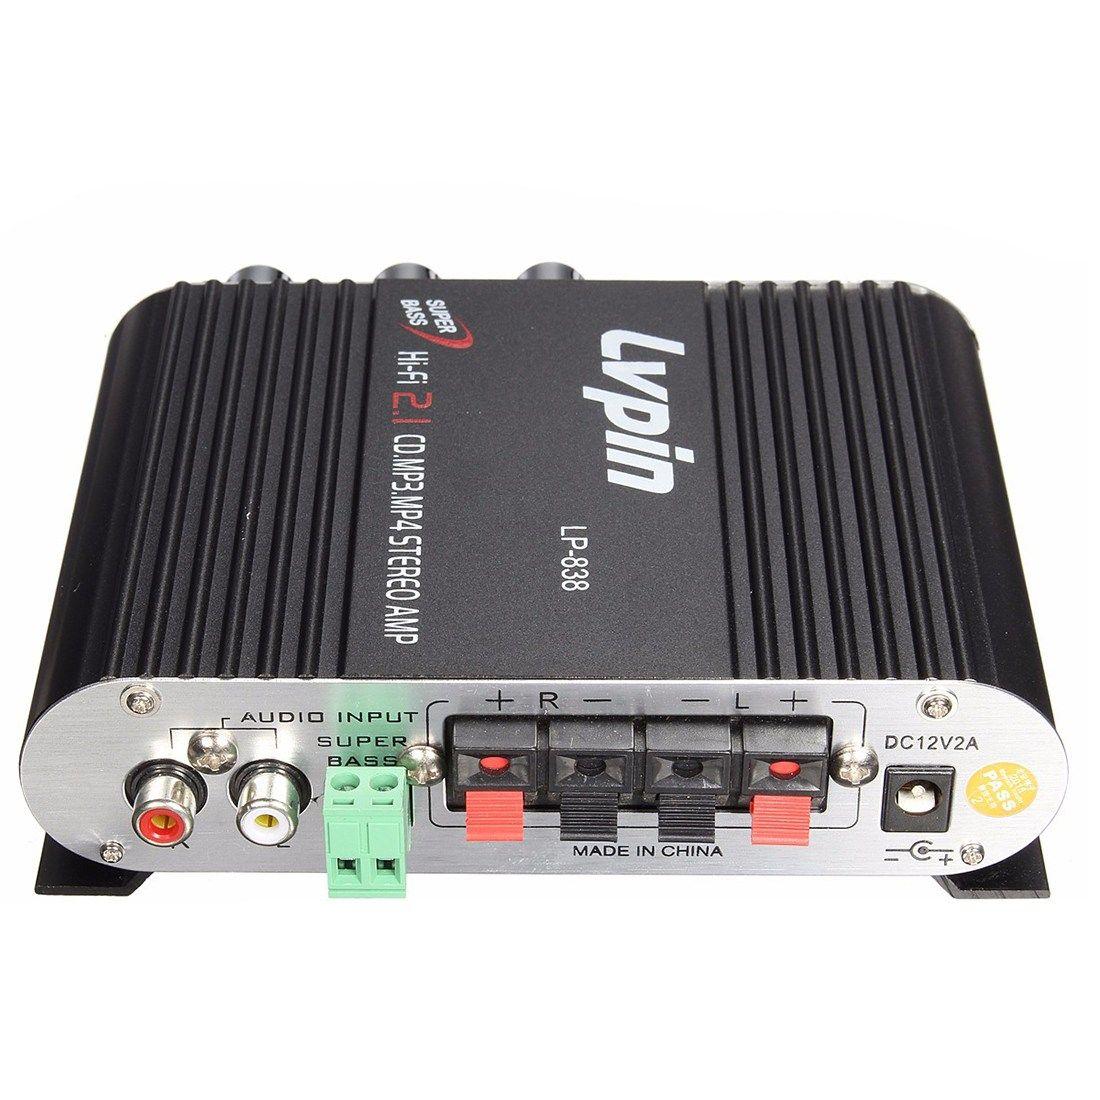 Pla For Lvpin 12v 200w Mini Hi Fi Stereo Amplifier Mp3 Car Radio Channels 2 House Super Bass